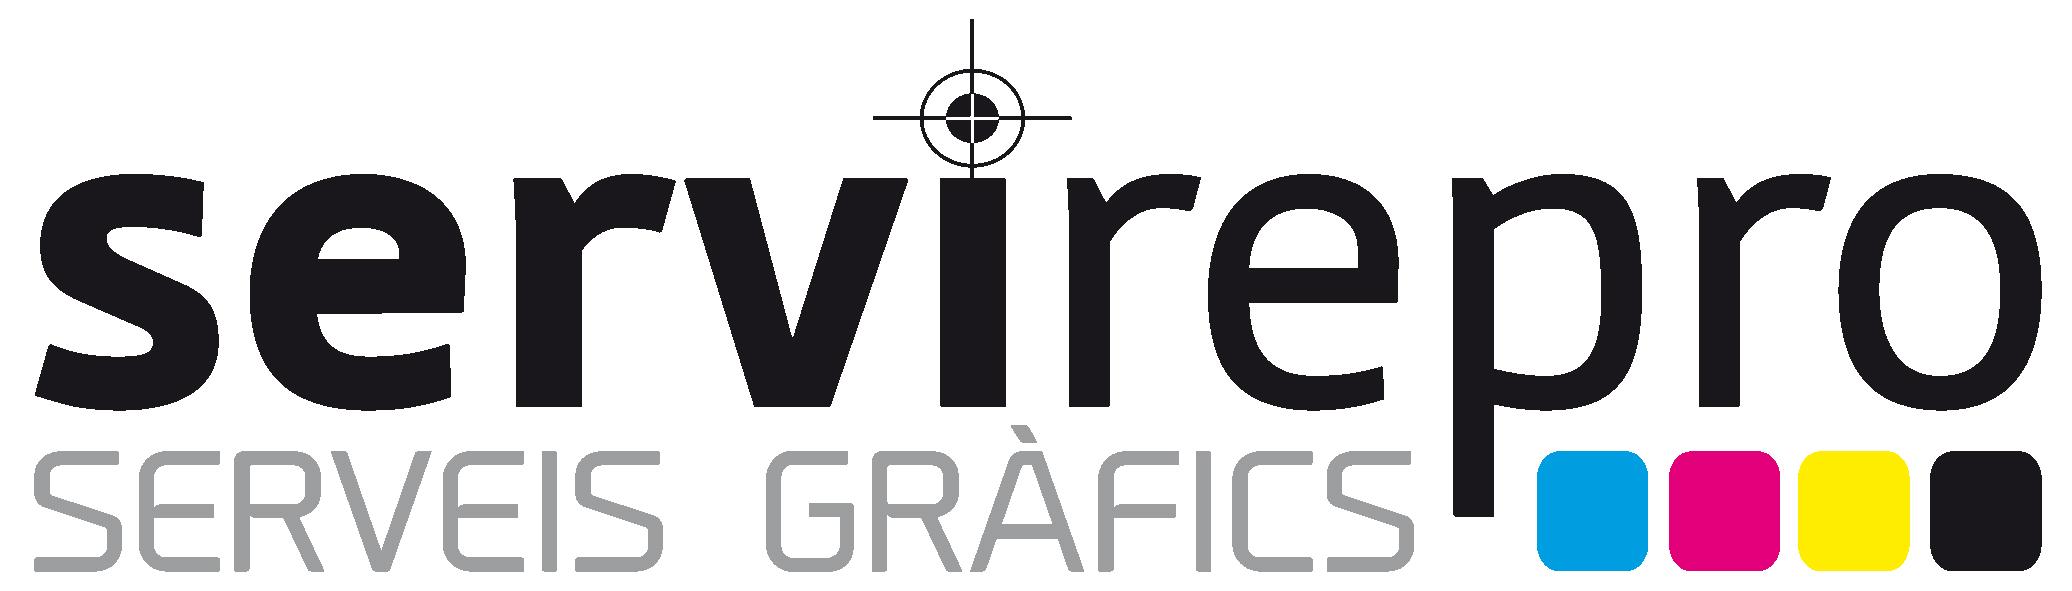 Logo comerç Servirepro Serveis Gràfics